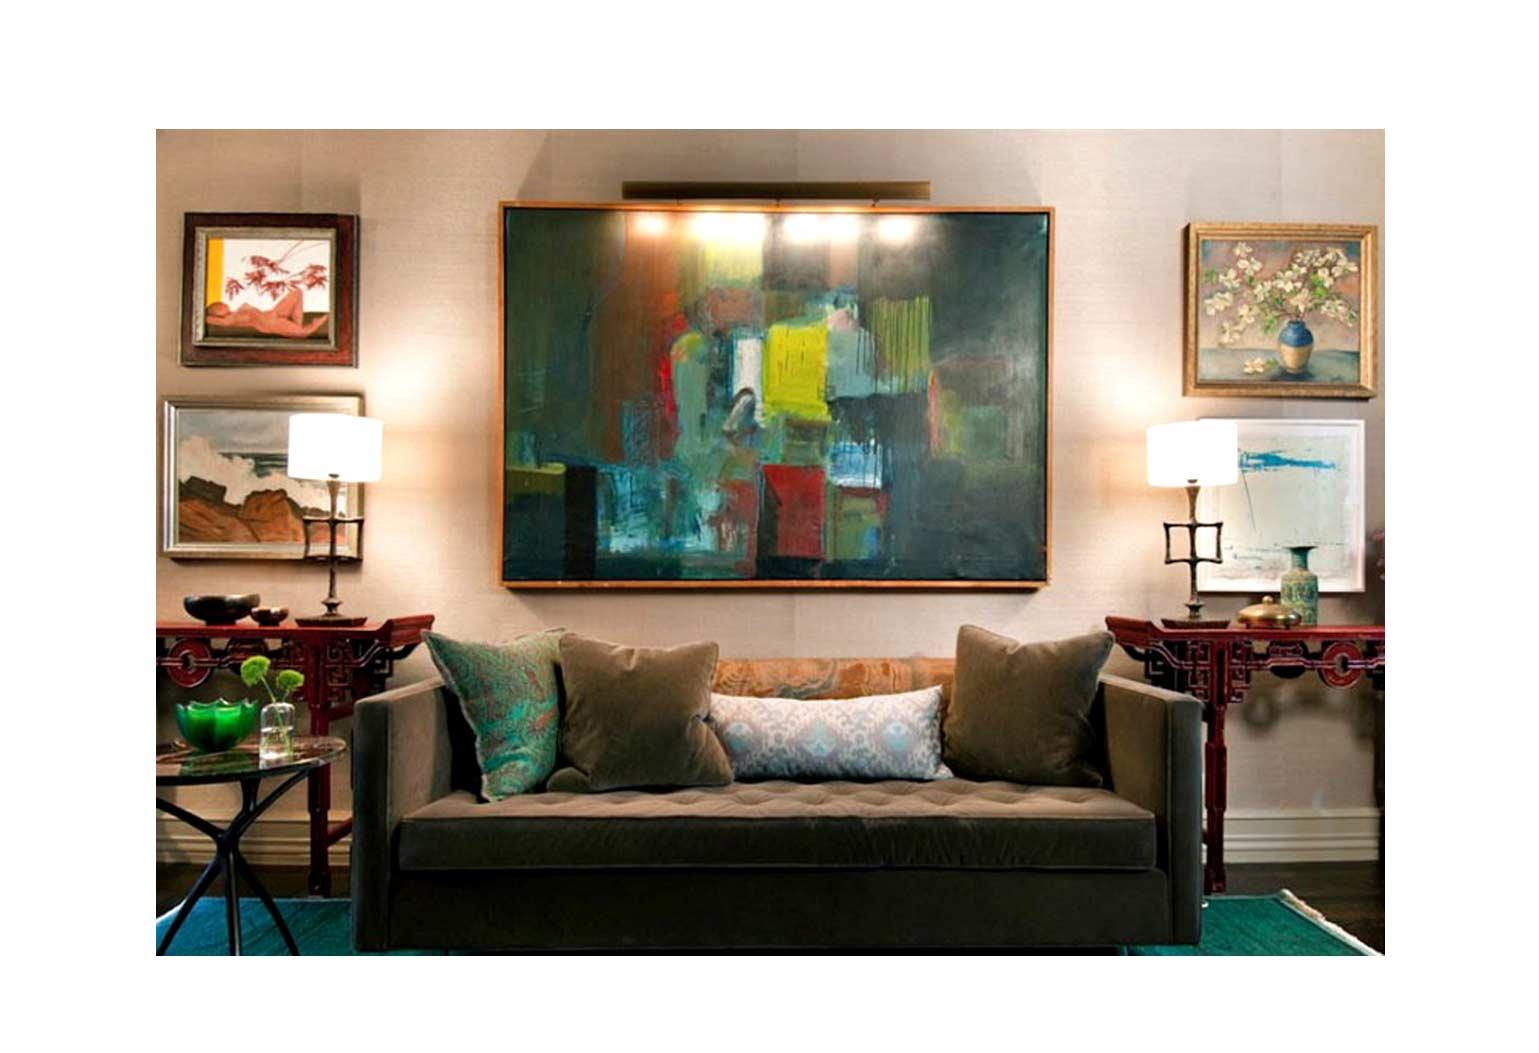 Design An Art centric Room02jpg - چگونه یک اتاق هنری را طراحی کنیم؟